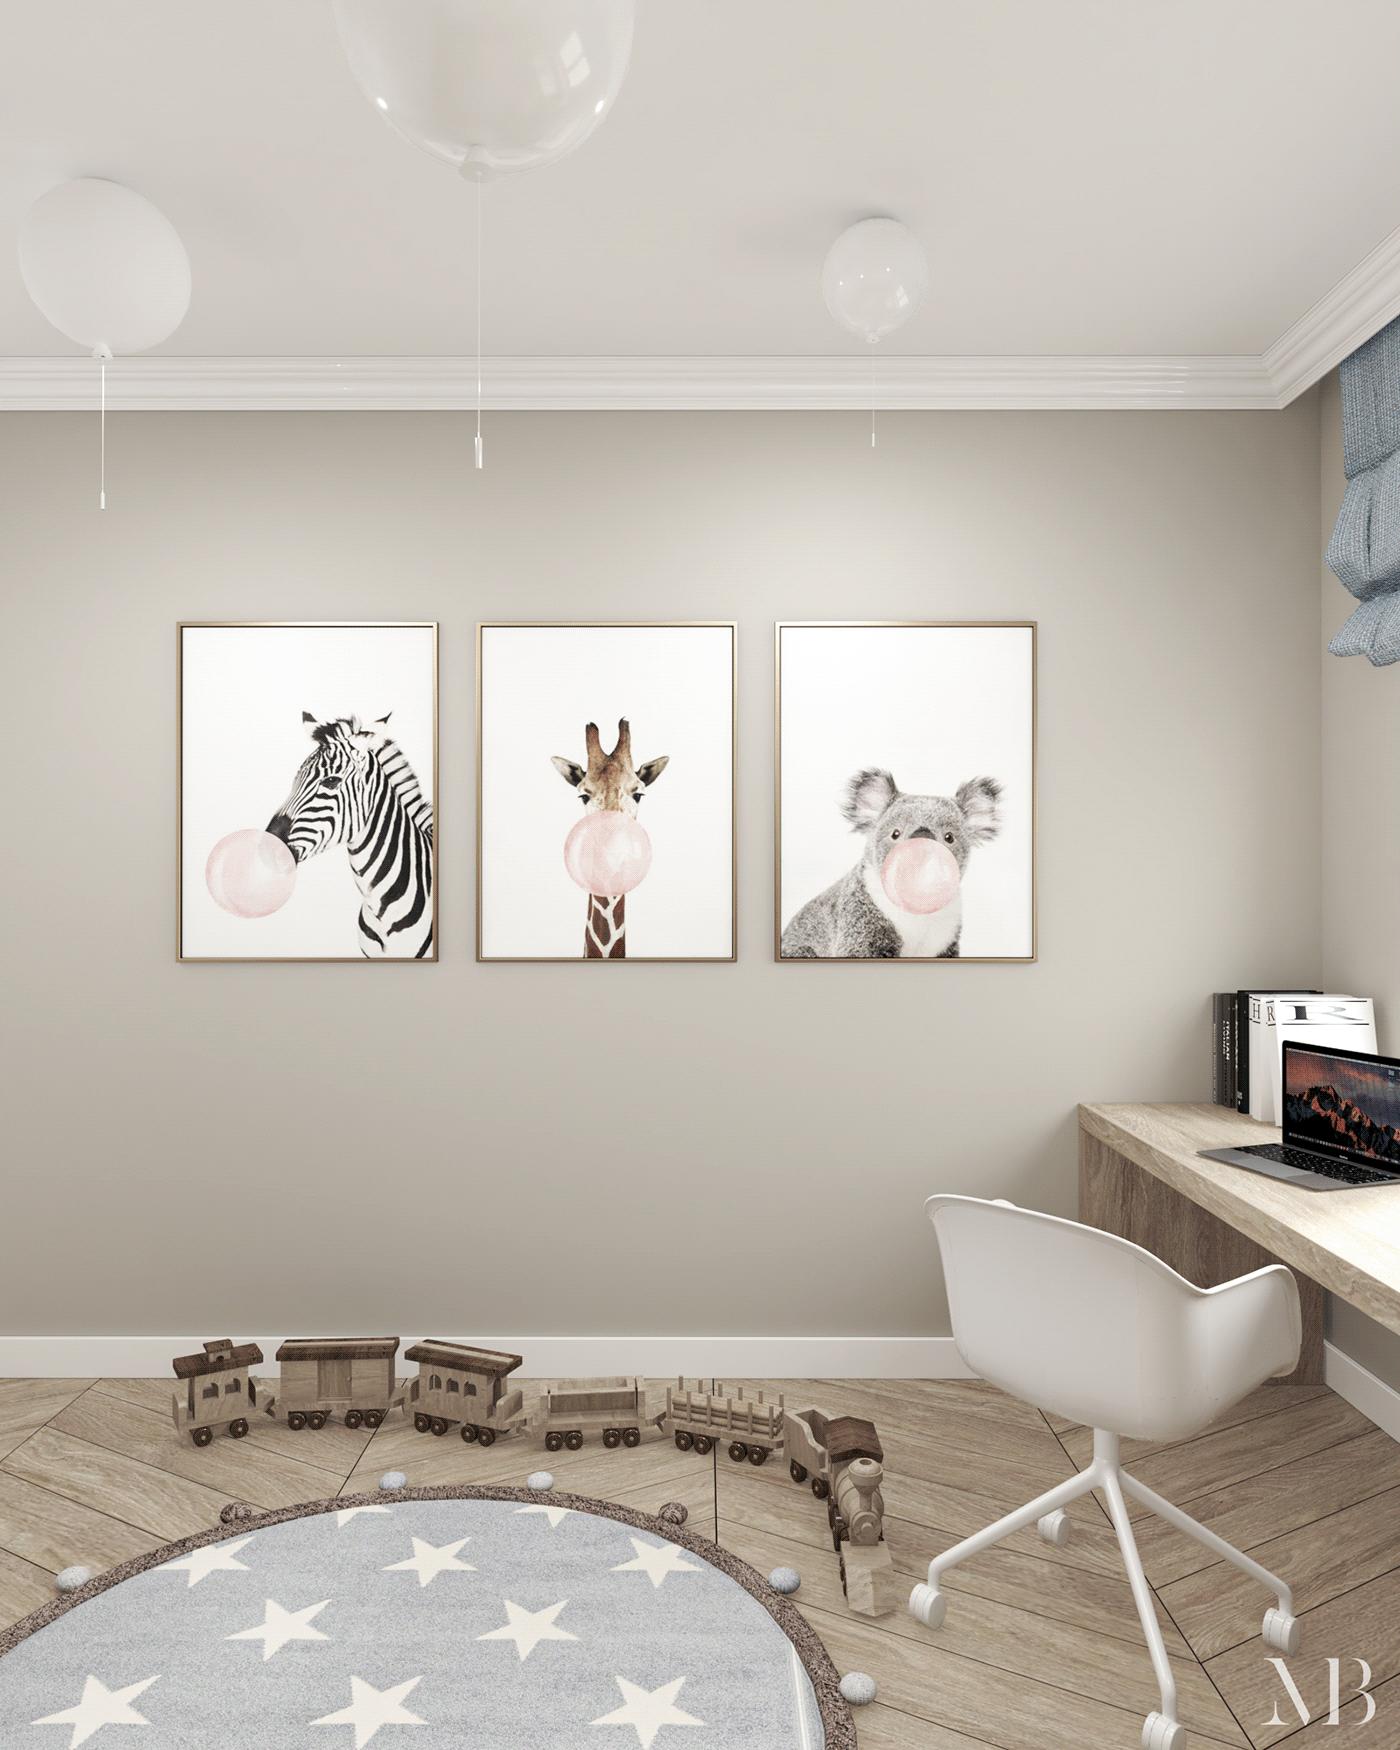 Image may contain: wall, indoor and cartoon